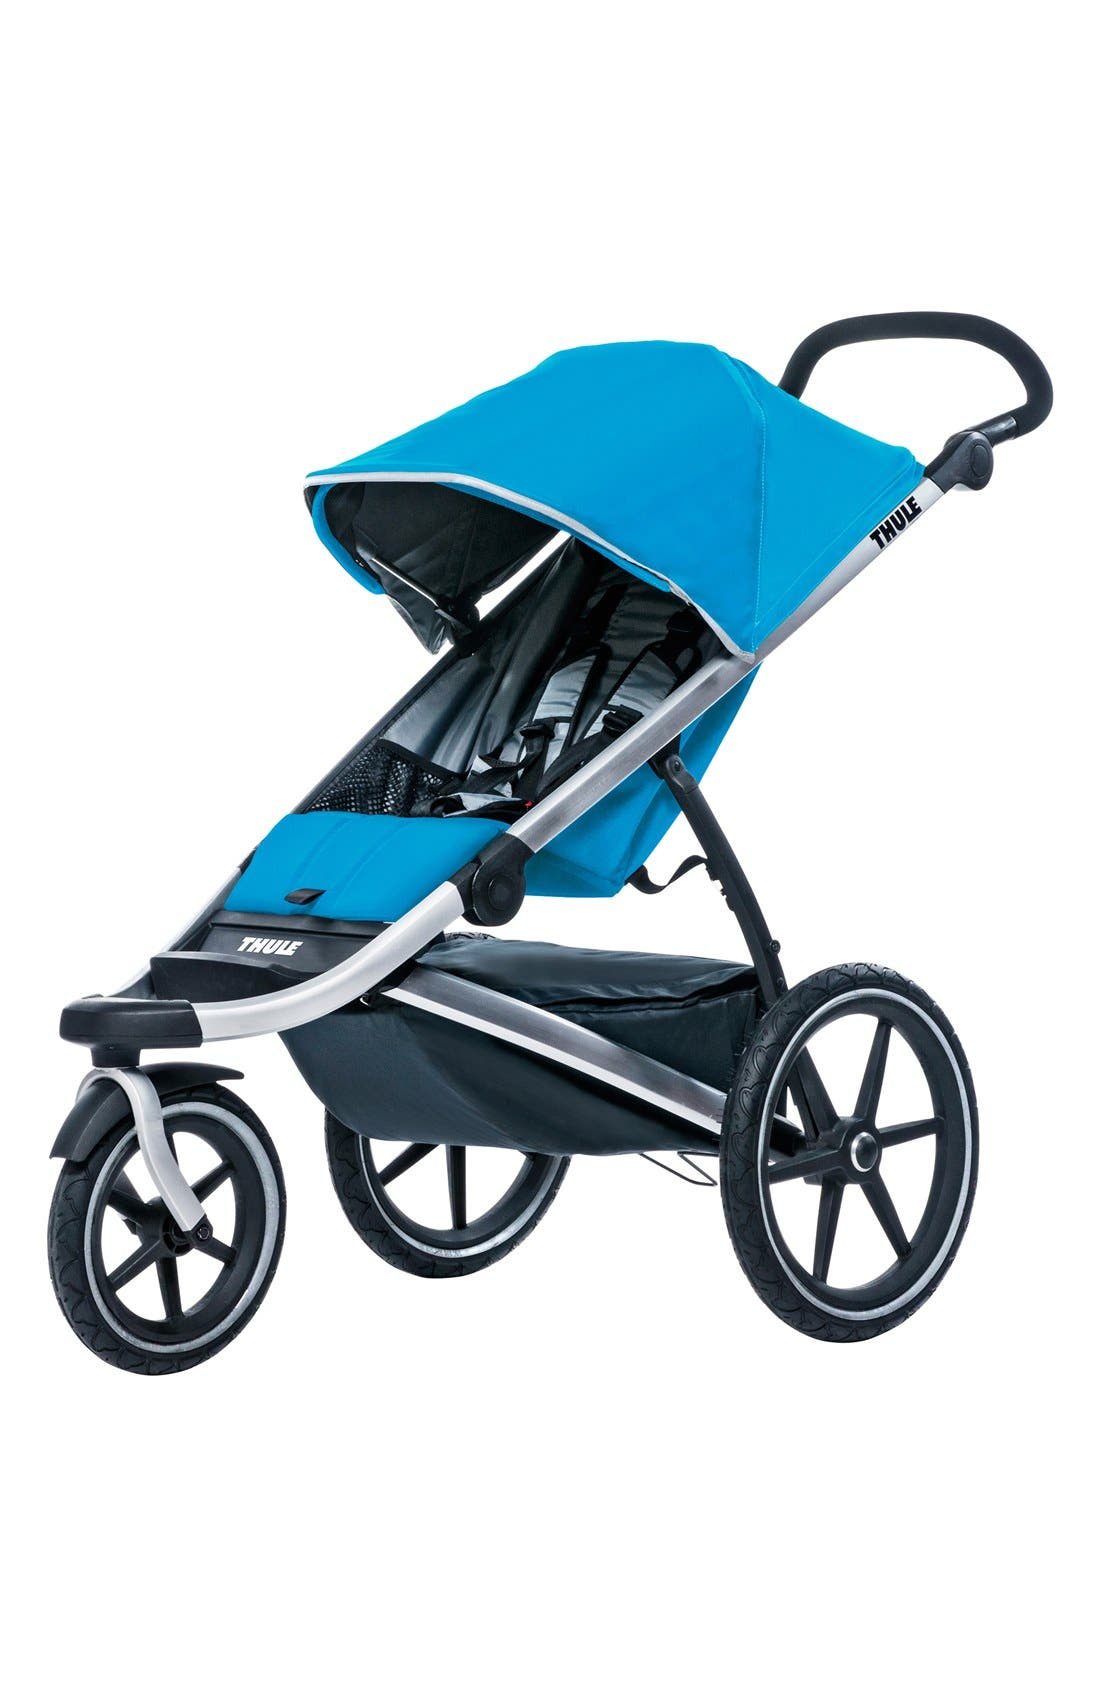 Main Image - Thule 'Urban Glide 1' Jogging Stroller